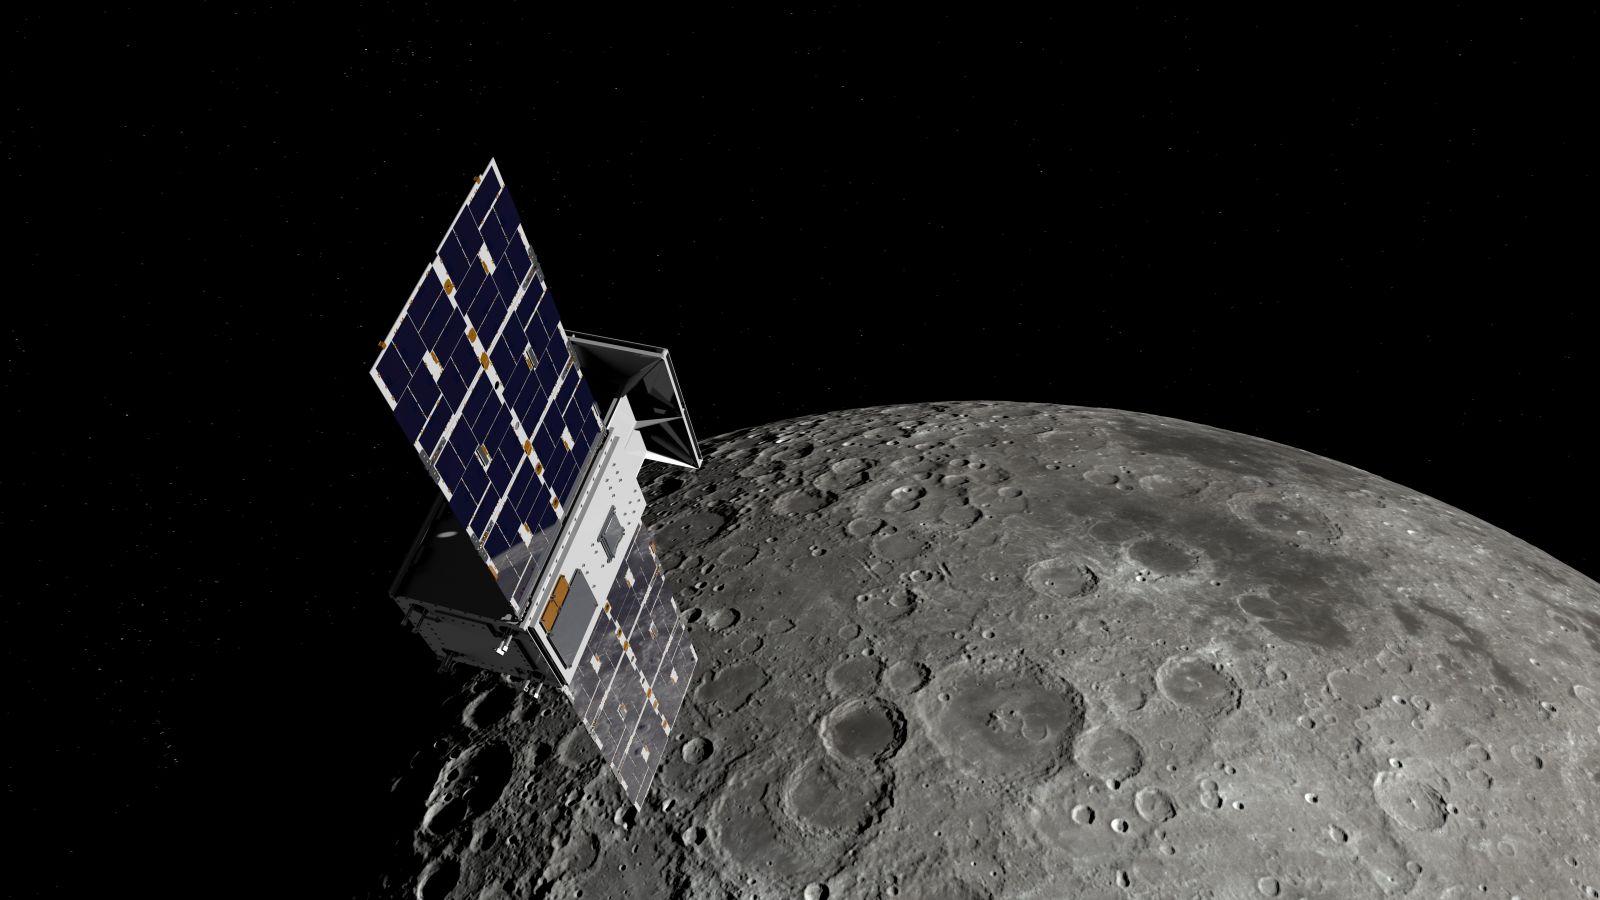 An illustration of NASA's CAPSTONE mission orbiting near the Moon. Credit: NASA